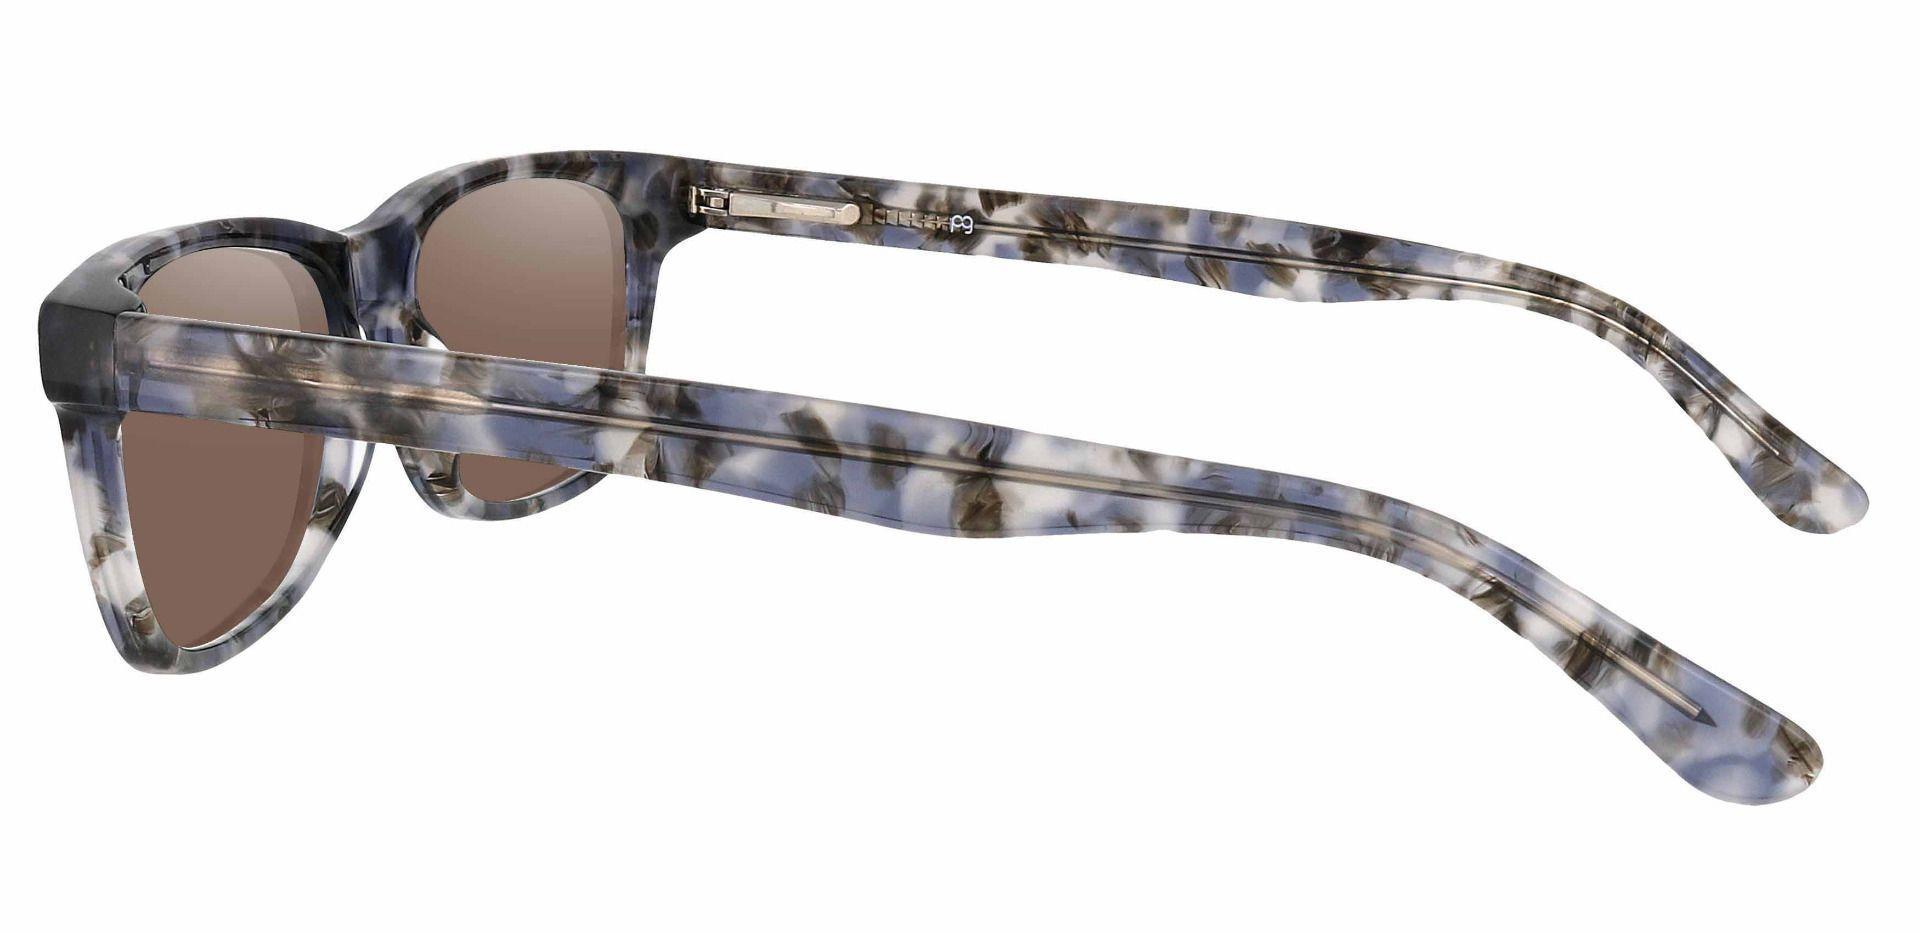 Hendrix Rectangle Prescription Sunglasses - Floral Frame With Brown Lenses